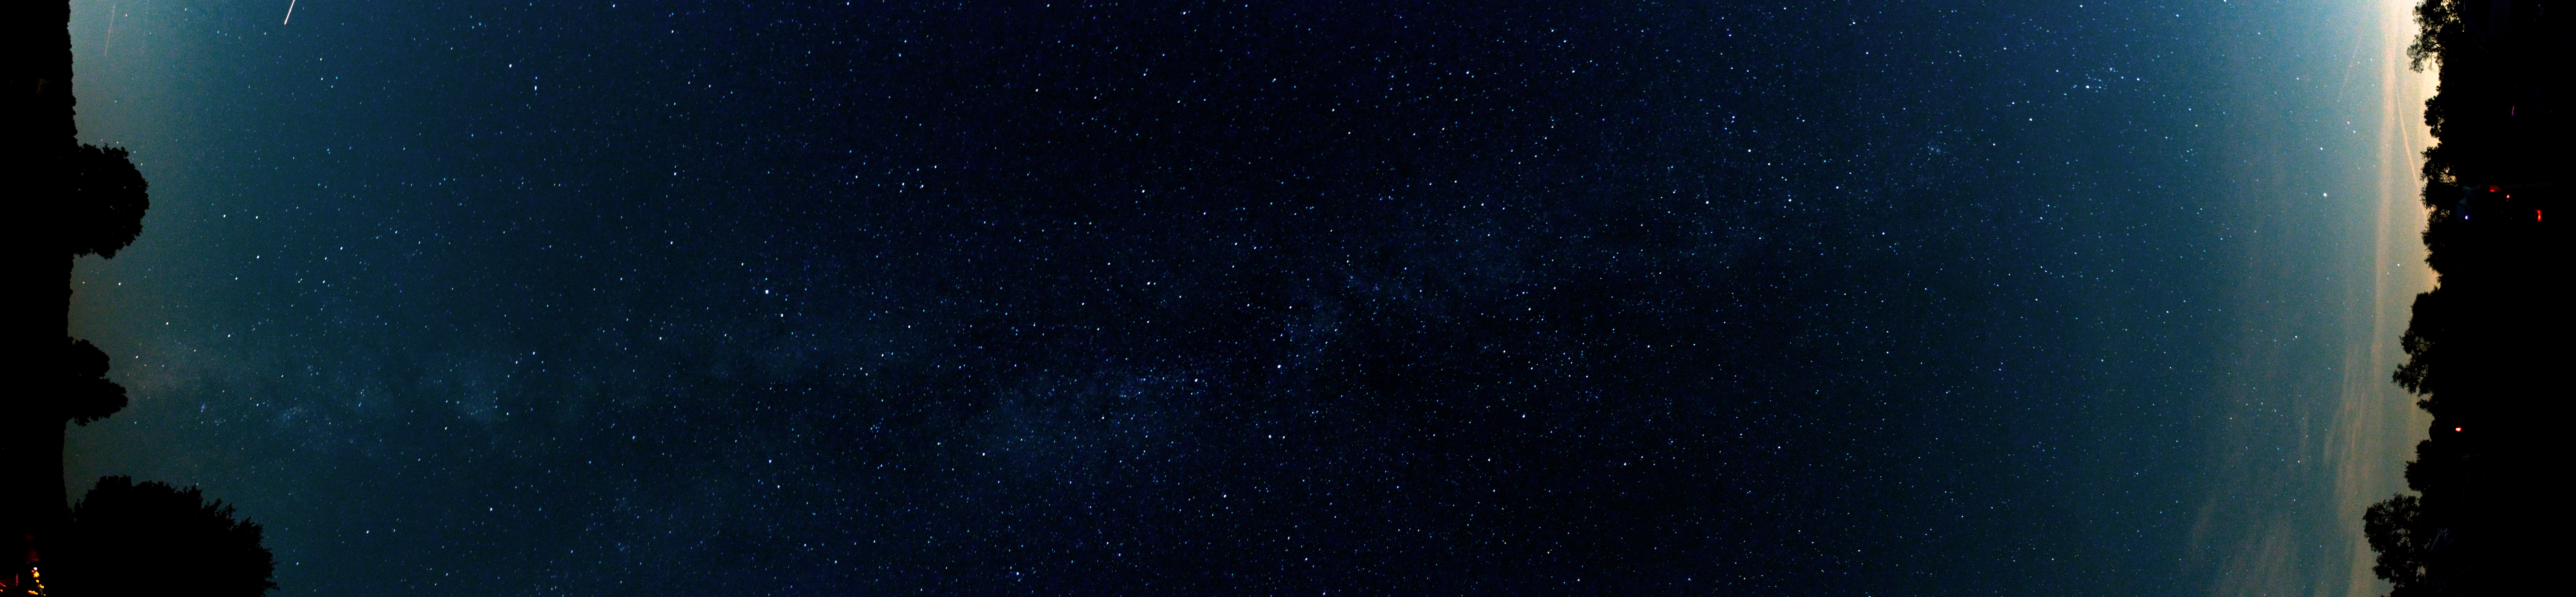 milkyway_panorama_minus_darks-9258210177cef2f998763904b93904ce69cceca8